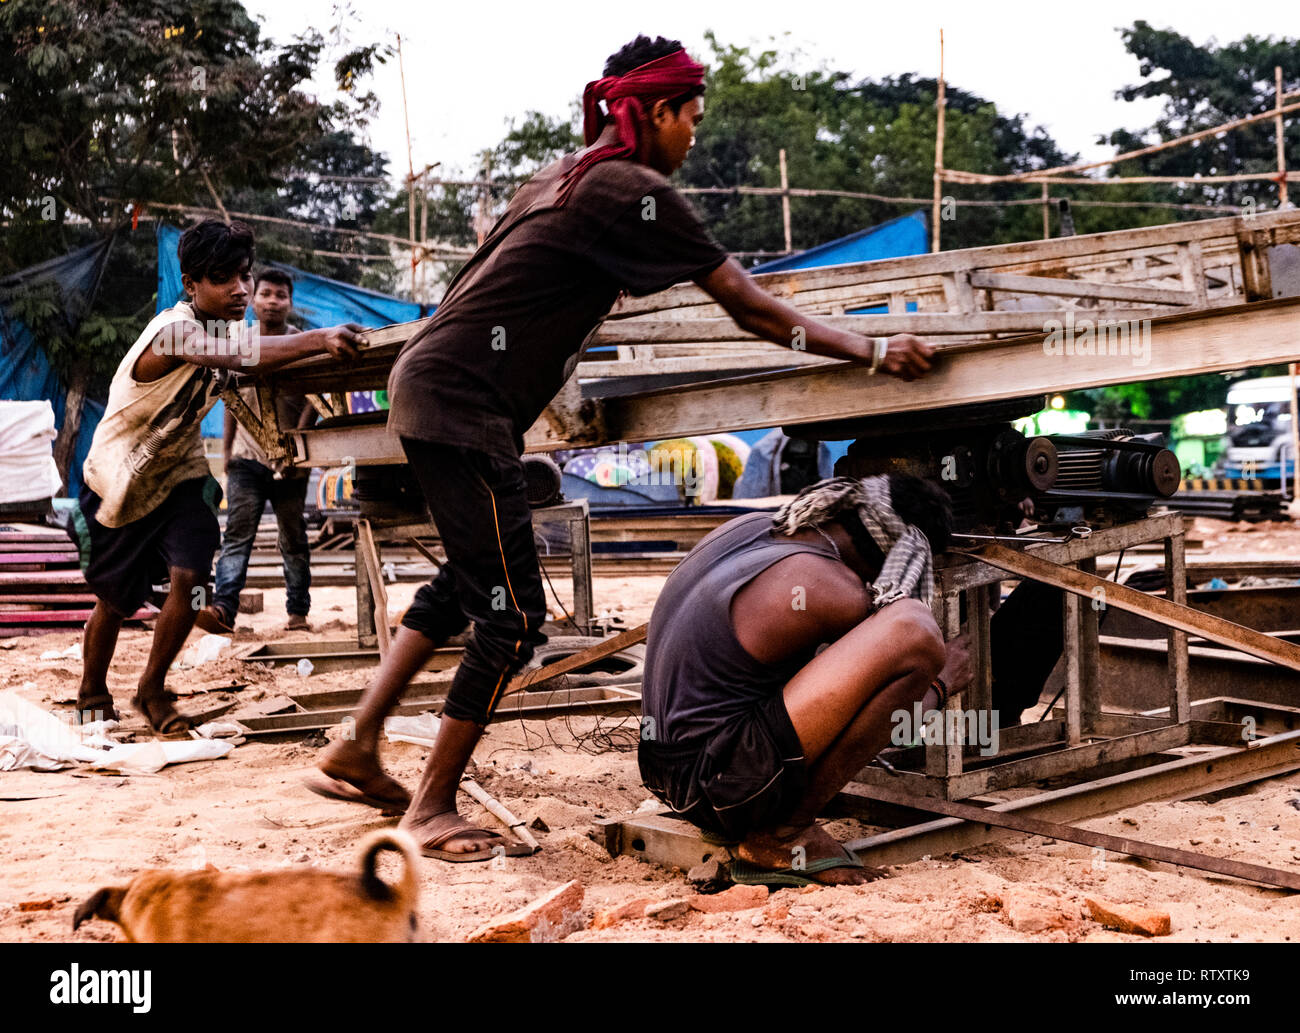 A group of young men dismantling a ferris wheel at the fair grounds Sahid Nagar, Bhubaneshwar. - Stock Image